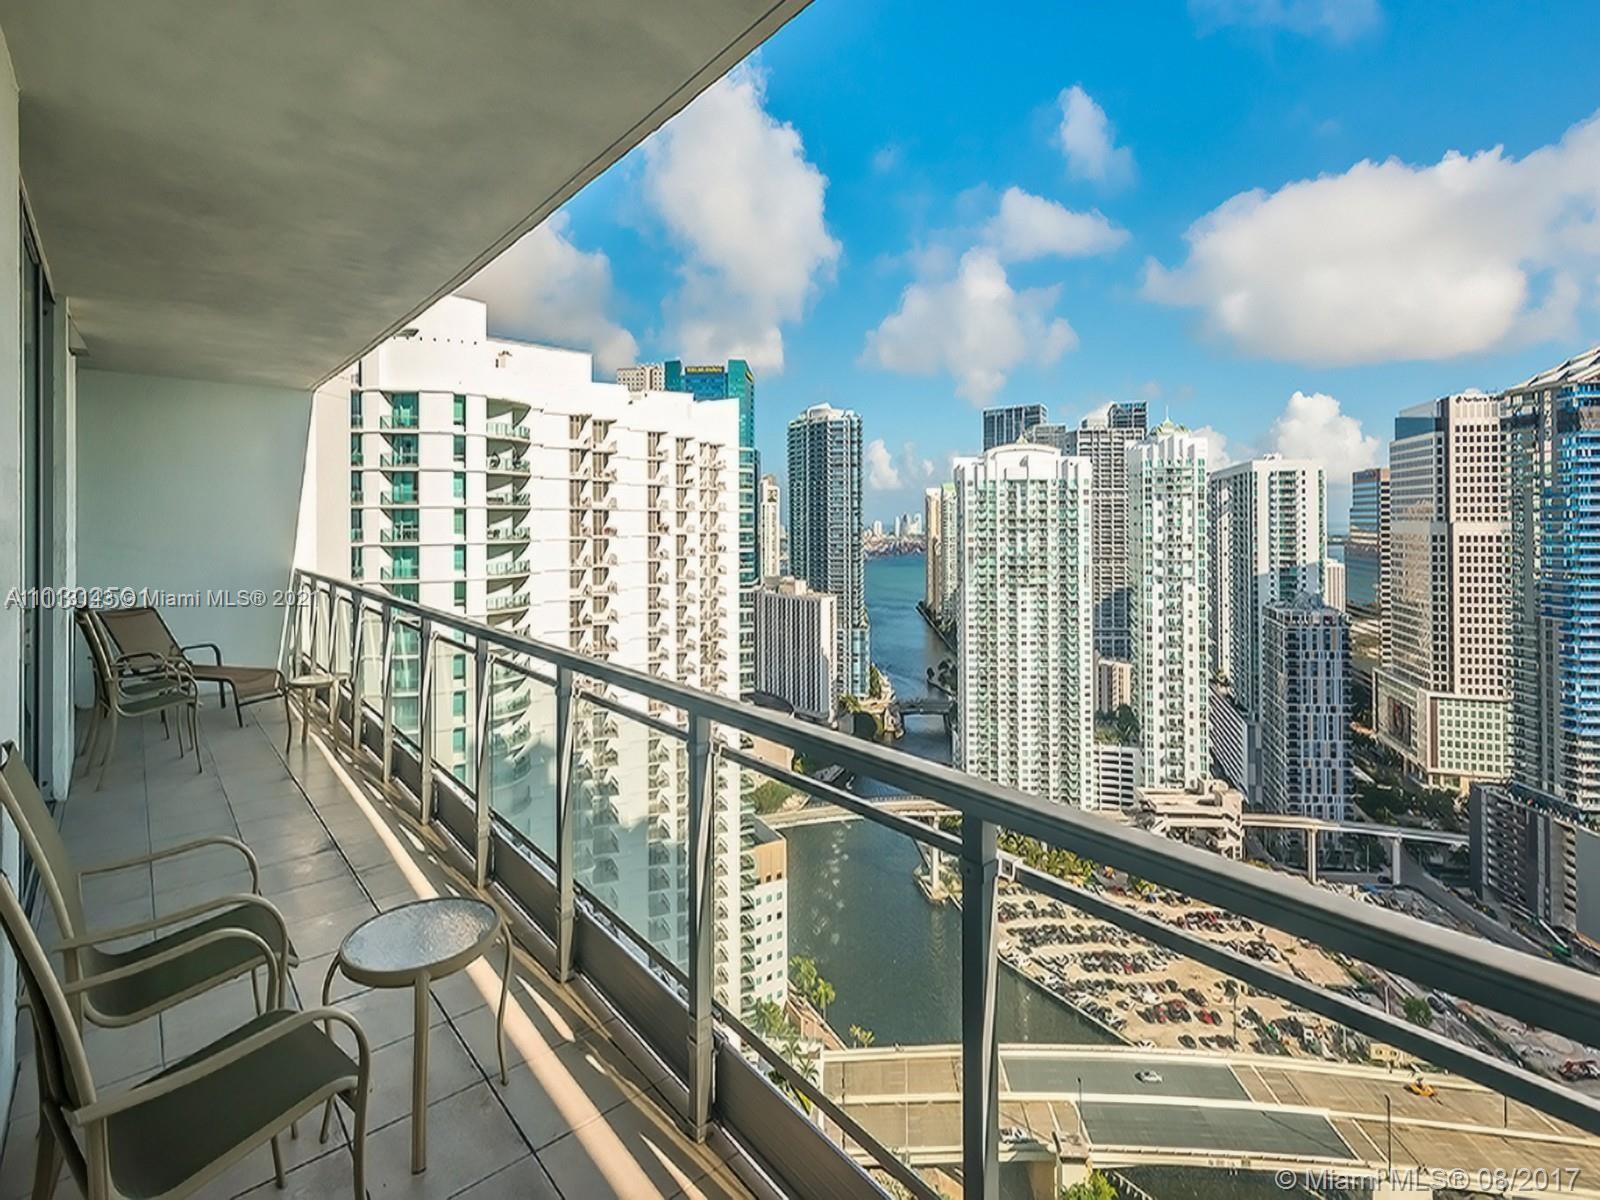 90 3rd St Unit 3810, Miami, Florida 33130